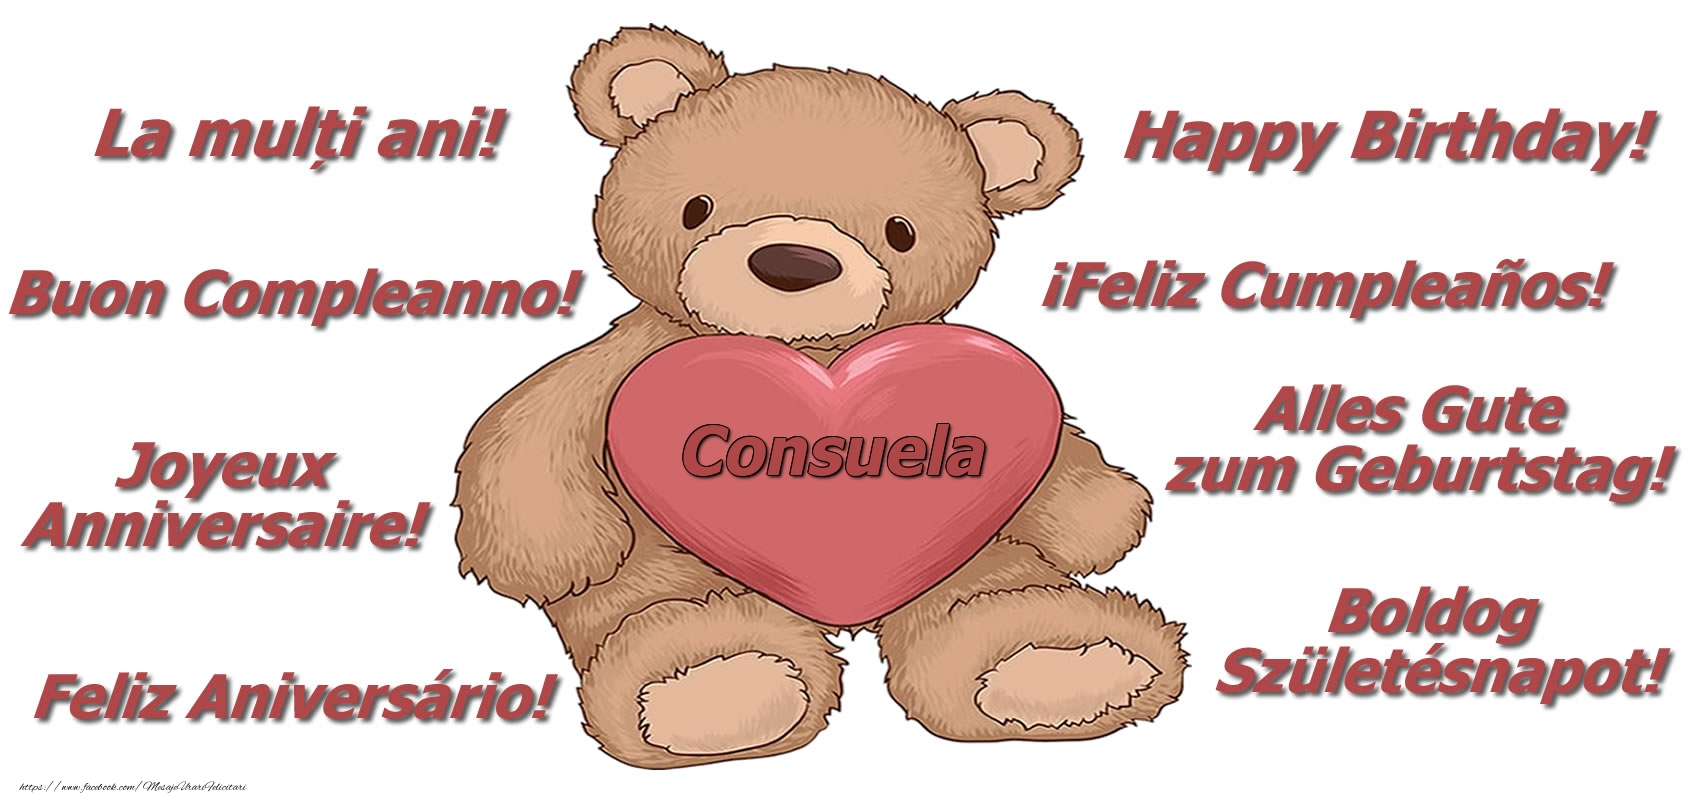 Felicitari de zi de nastere - La multi ani Consuela! - Ursulet